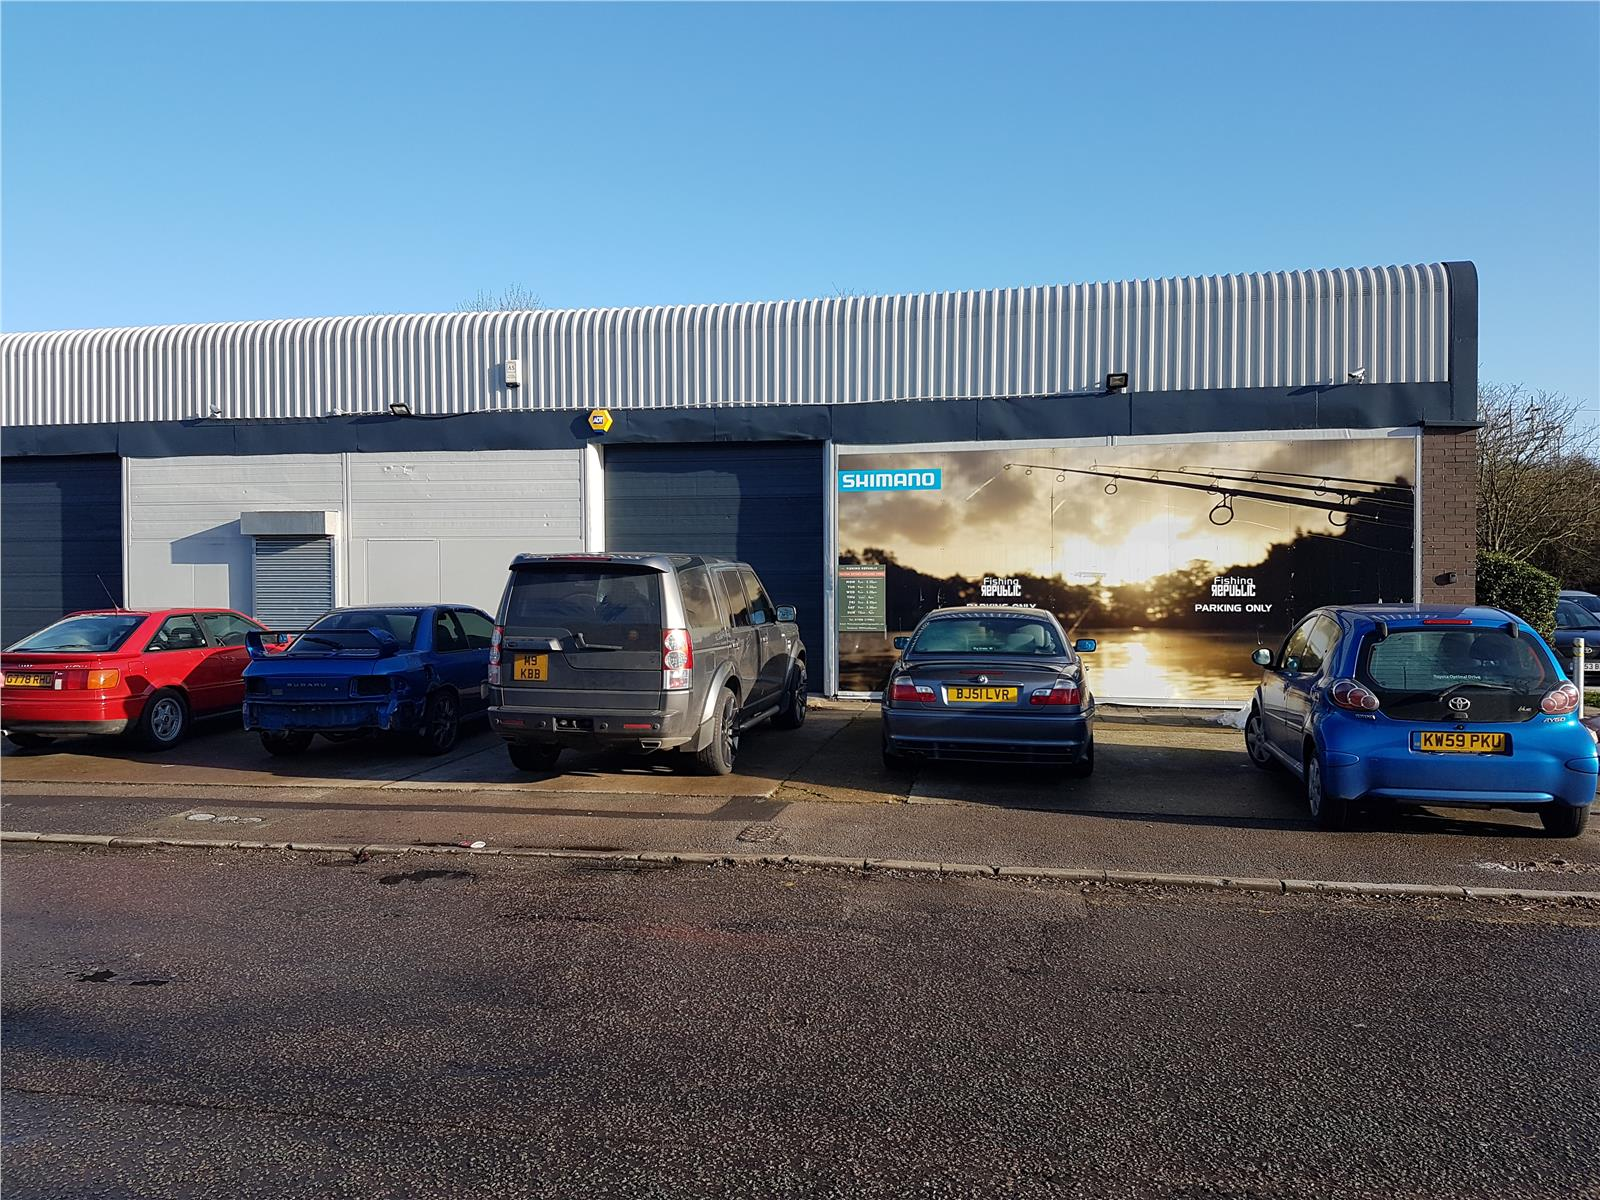 11/12 Stacey Bushes Trading Estate, Erica Road, Stacey Bushes, Milton Keynes, Buckinghamshire, MK12